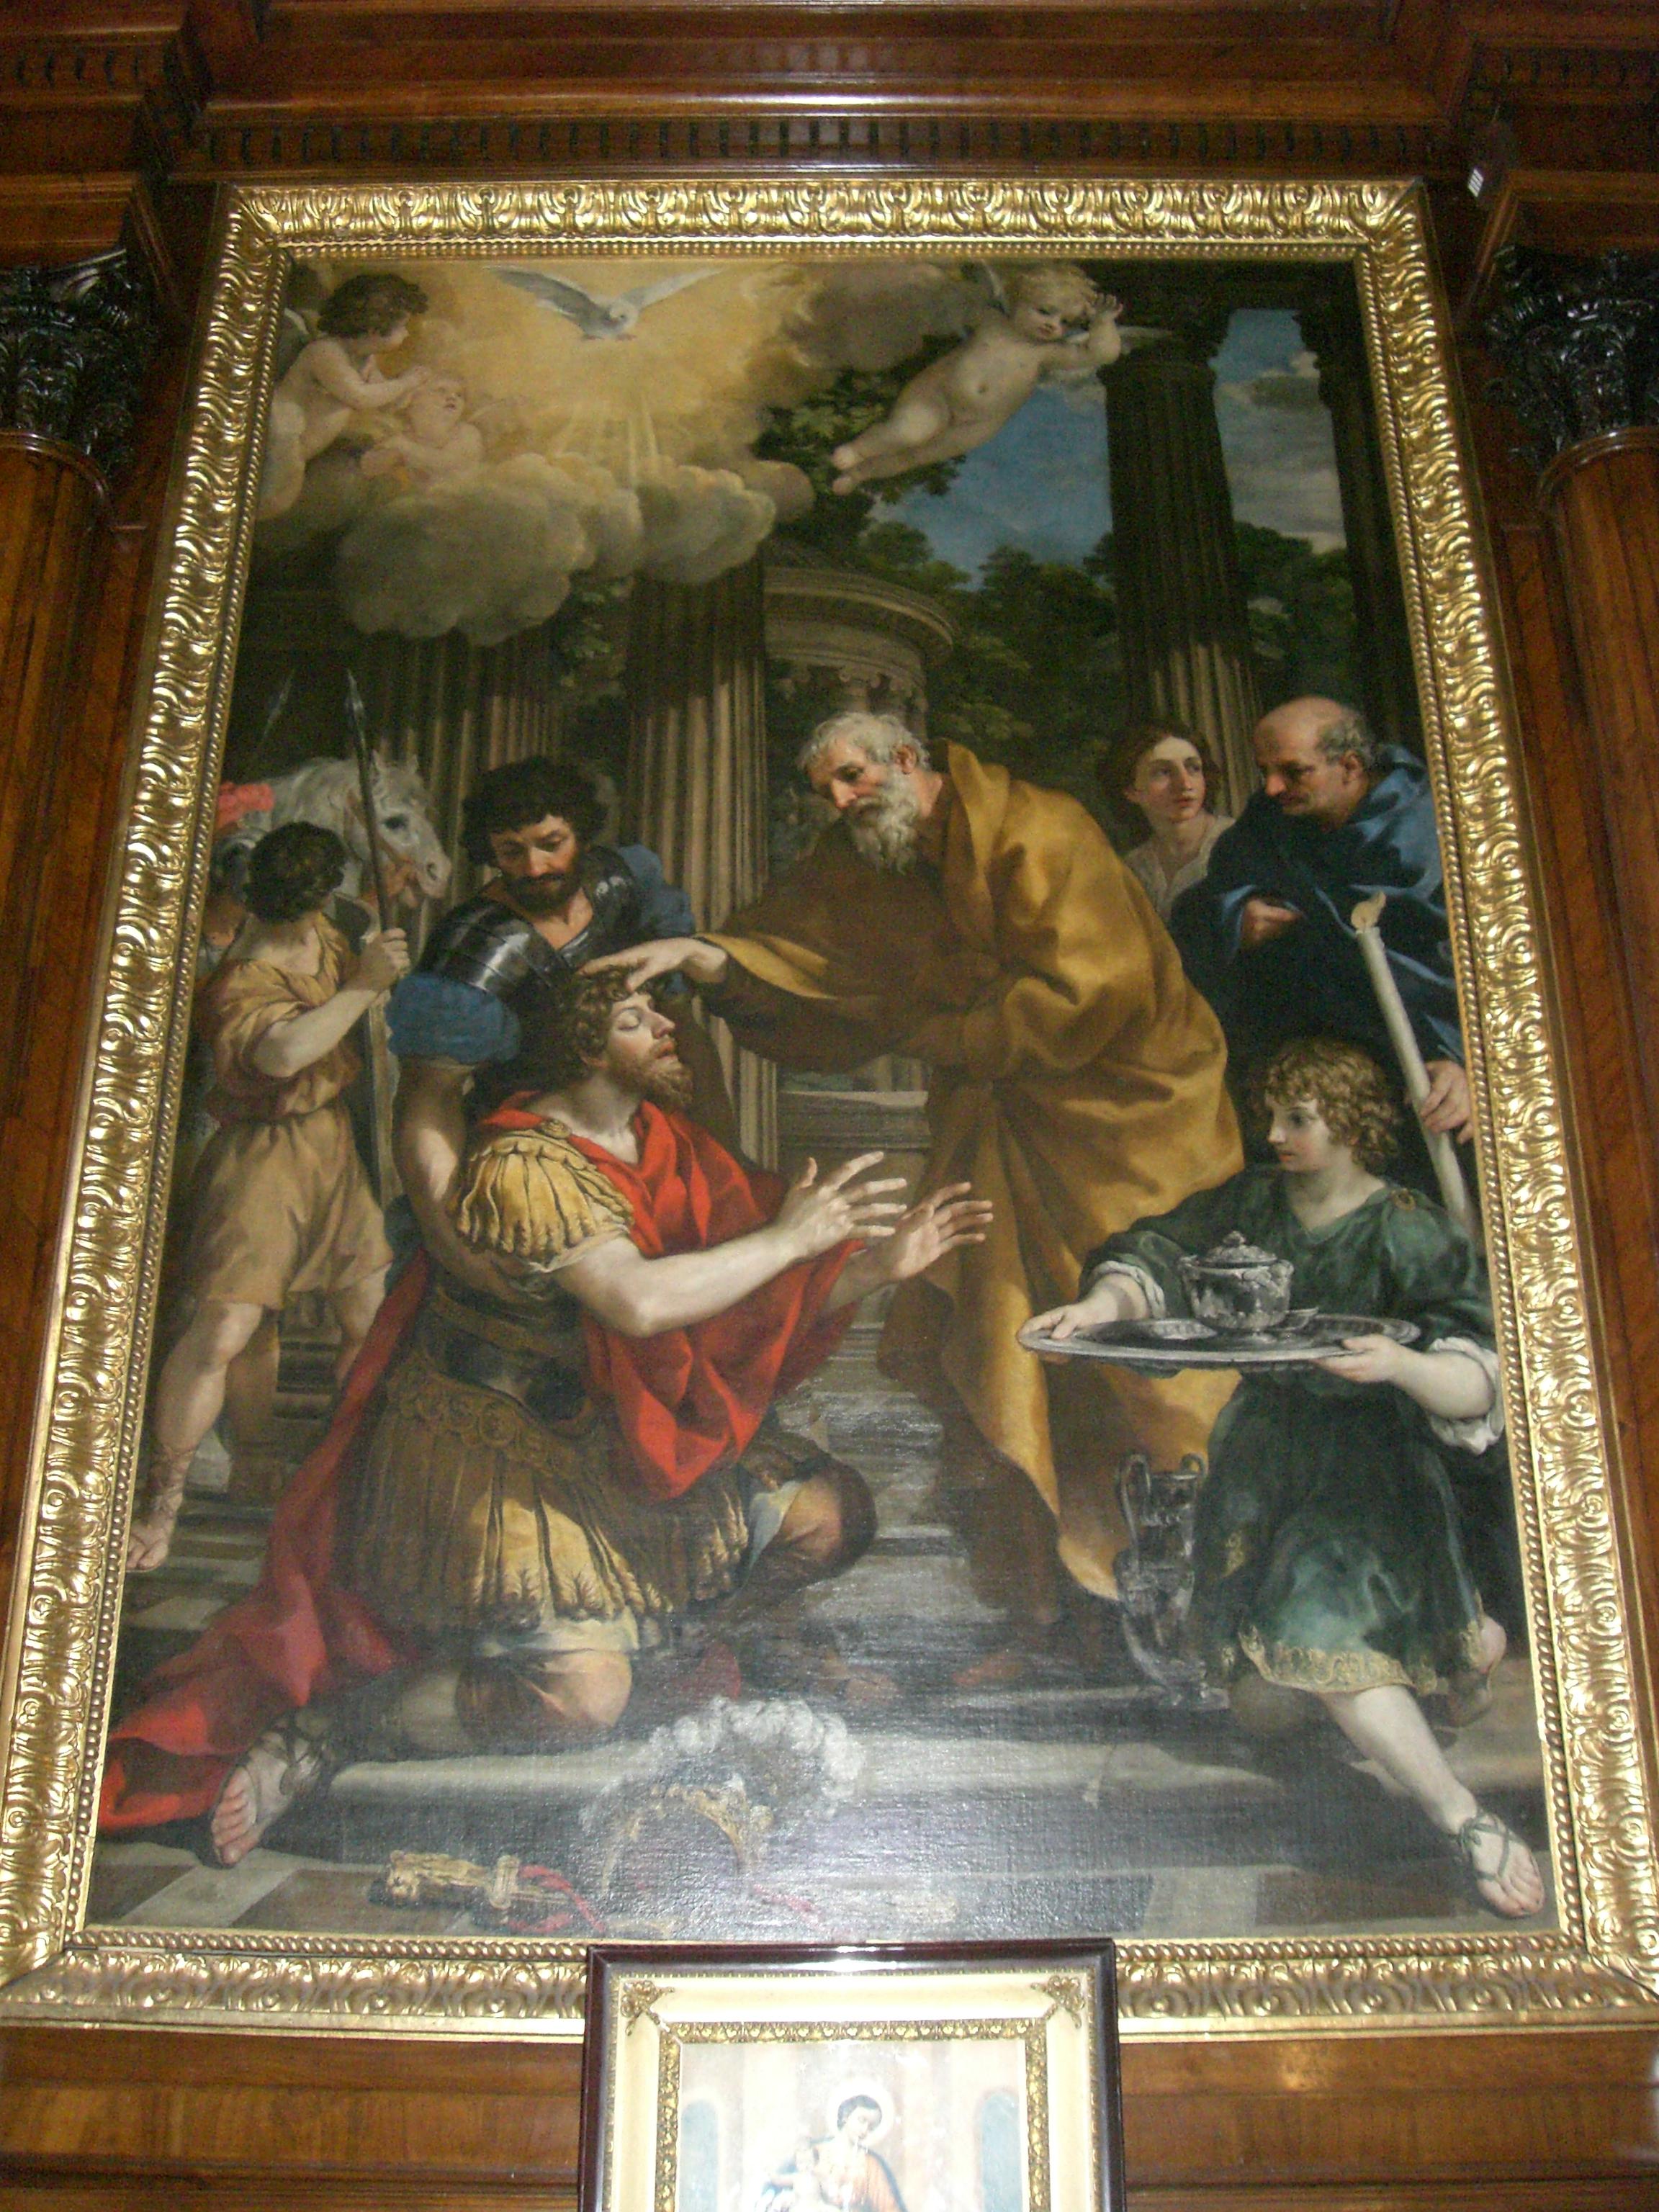 painting of saint peter healing cornelius  acts 9 32